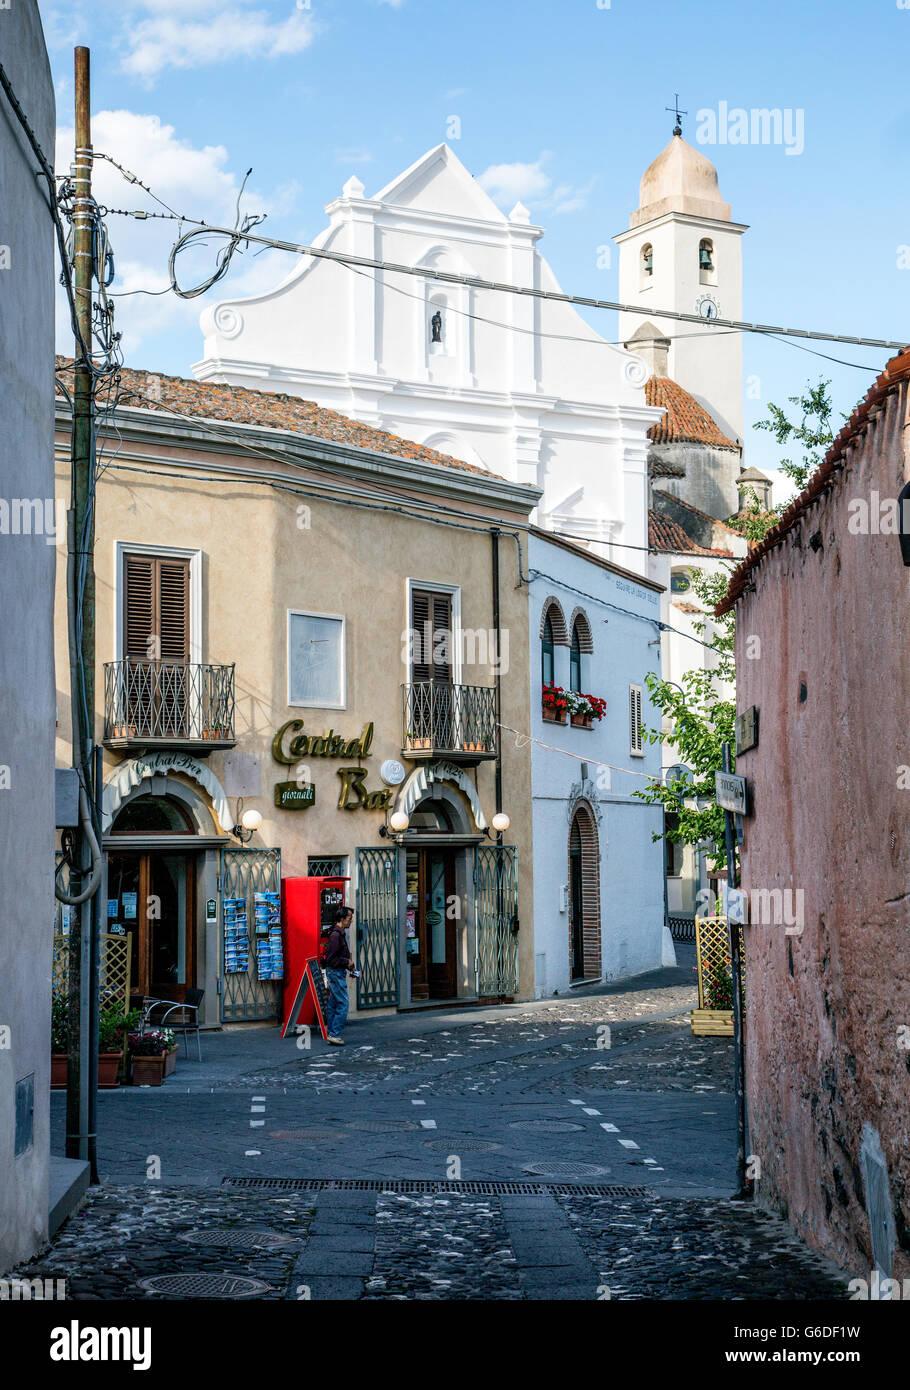 Calles empedradas Orosei Cerdeña Italia Imagen De Stock